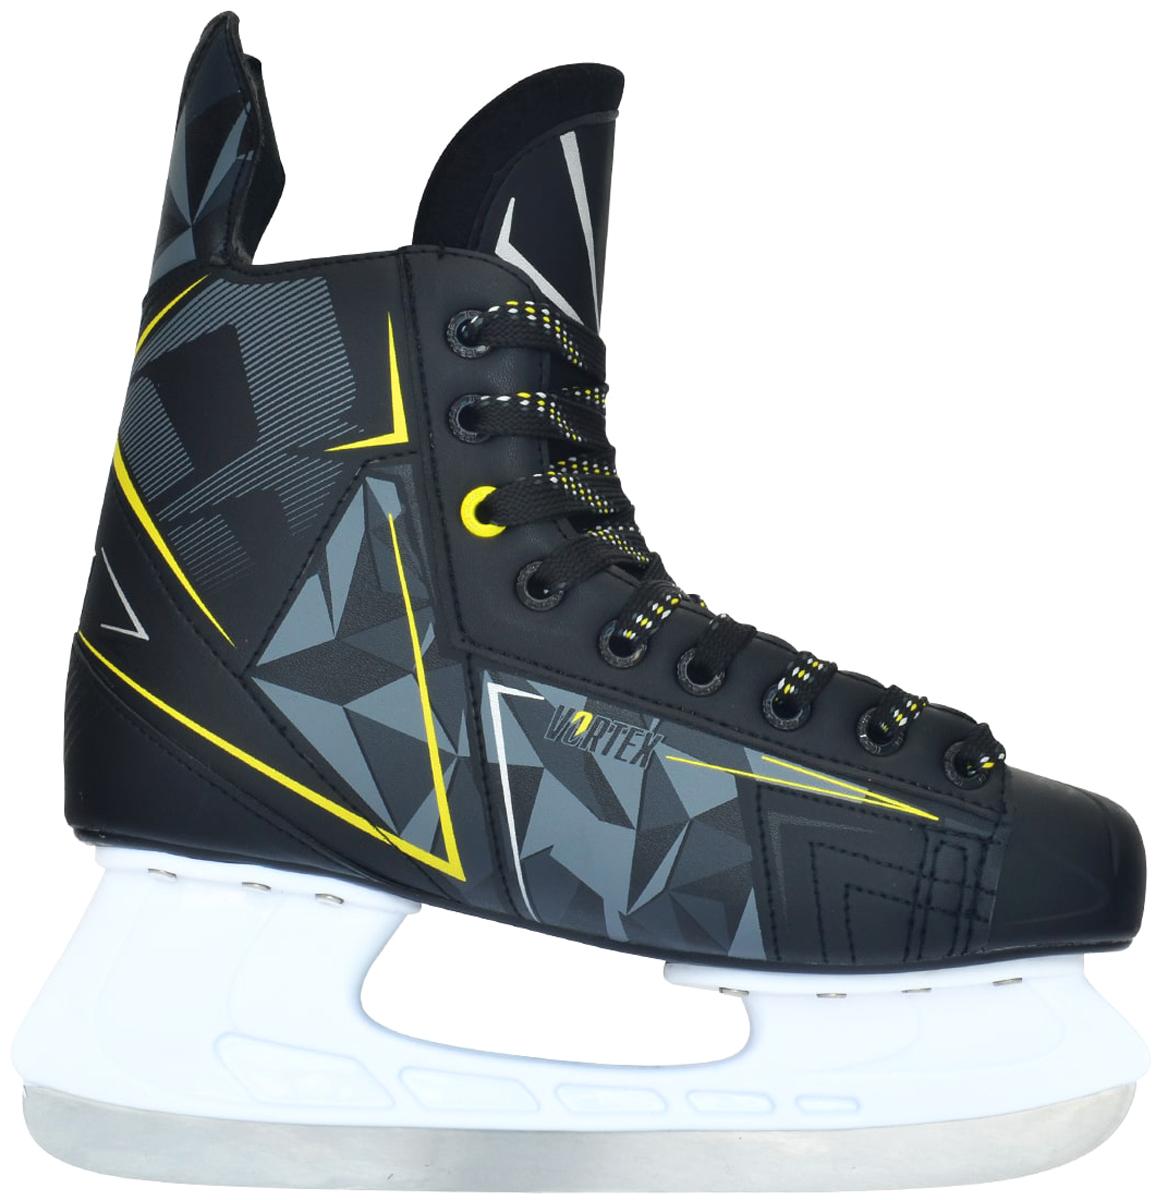 "Коньки хоккейные мужские Ice Blade ""Vortex"", цвет: серый, желтый, белый. Размер 46"